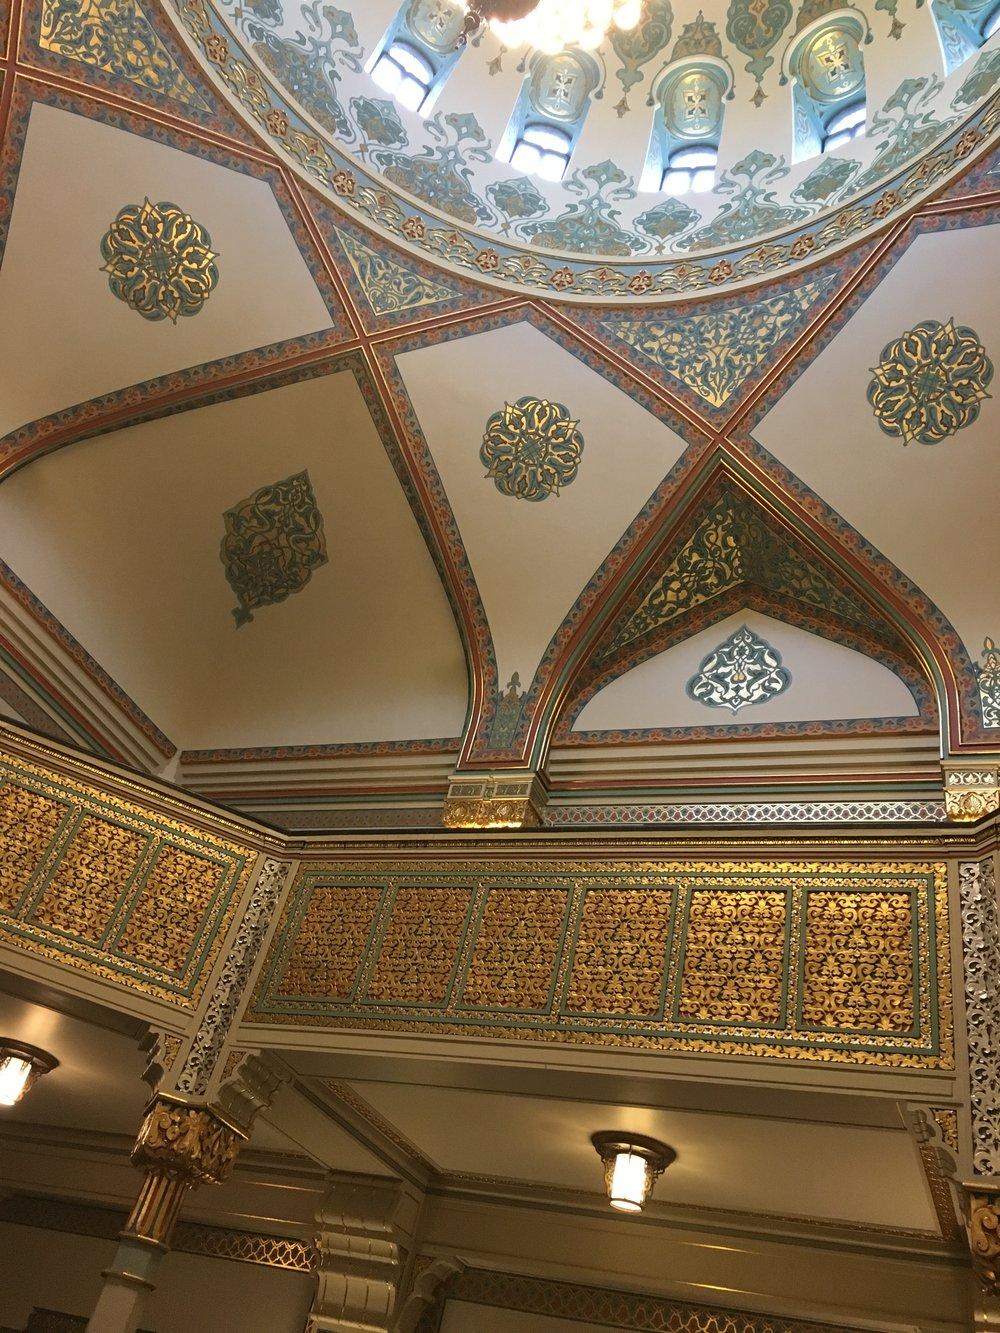 Tripoli Shrine Center in Milwaukee